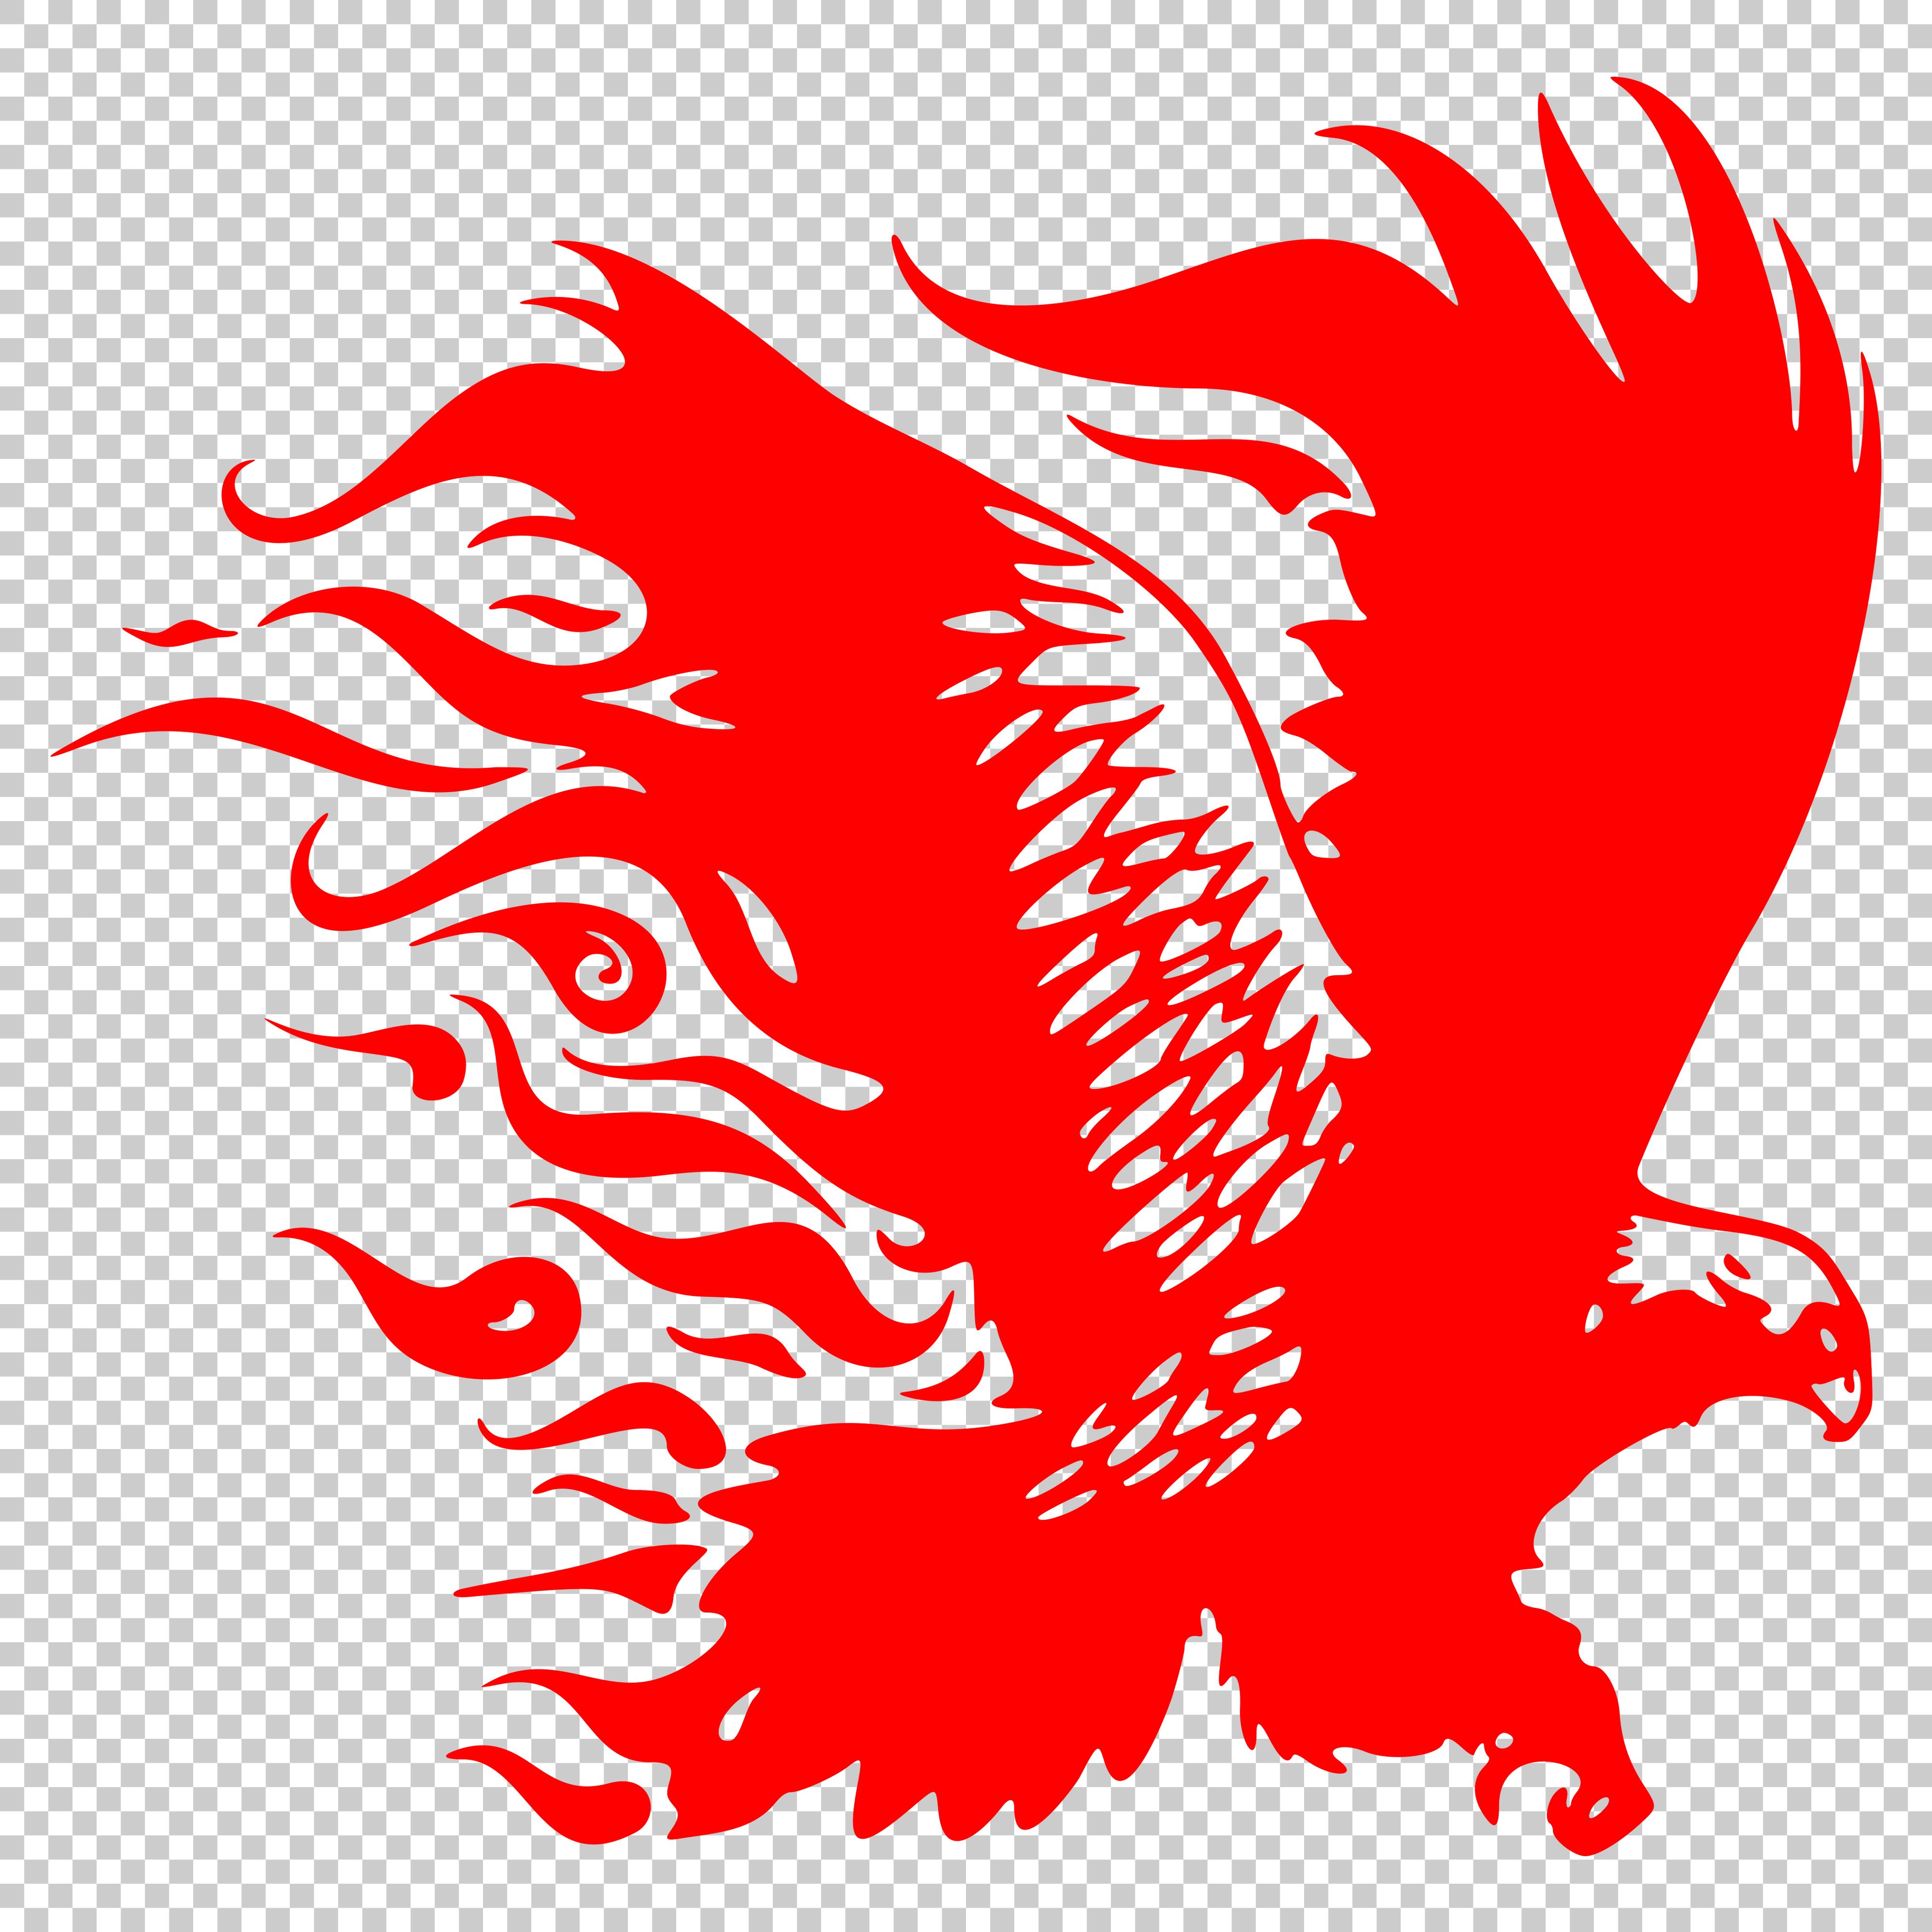 Eagle Hawk Bird Png Image With Transparent Background Png Images Hawk Bird Stock Images Free